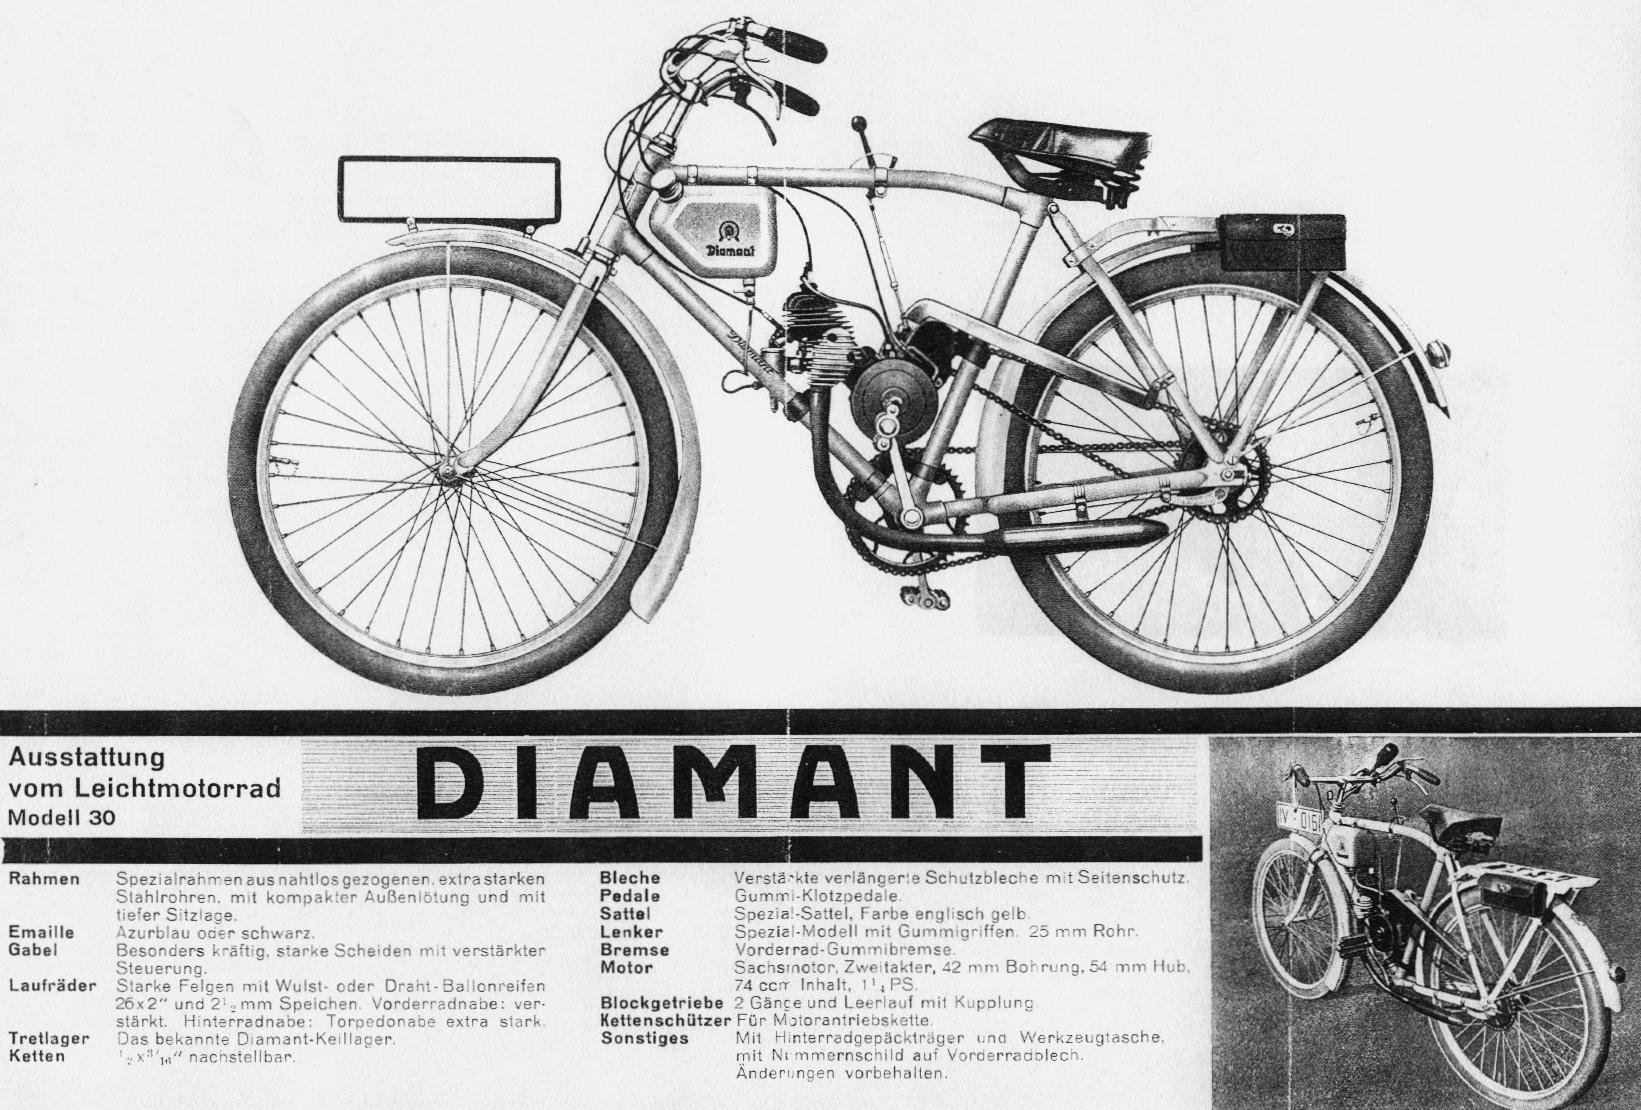 European Lightweight Motorized Bicycles